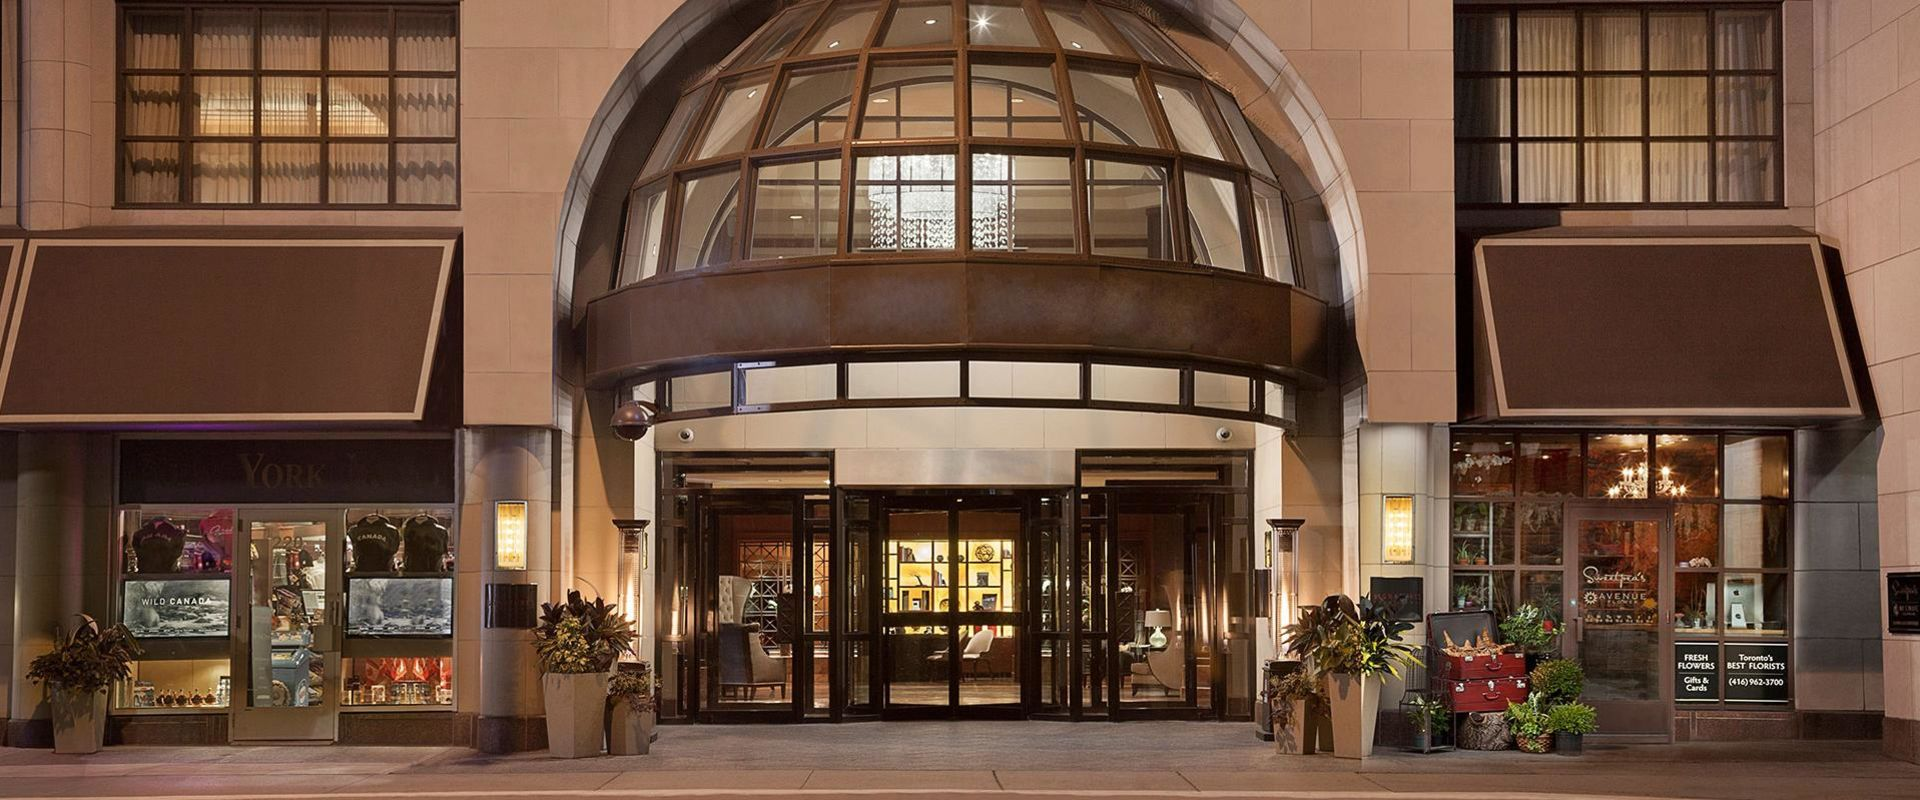 Yorkville Toronto Exterior Hotel Entrance